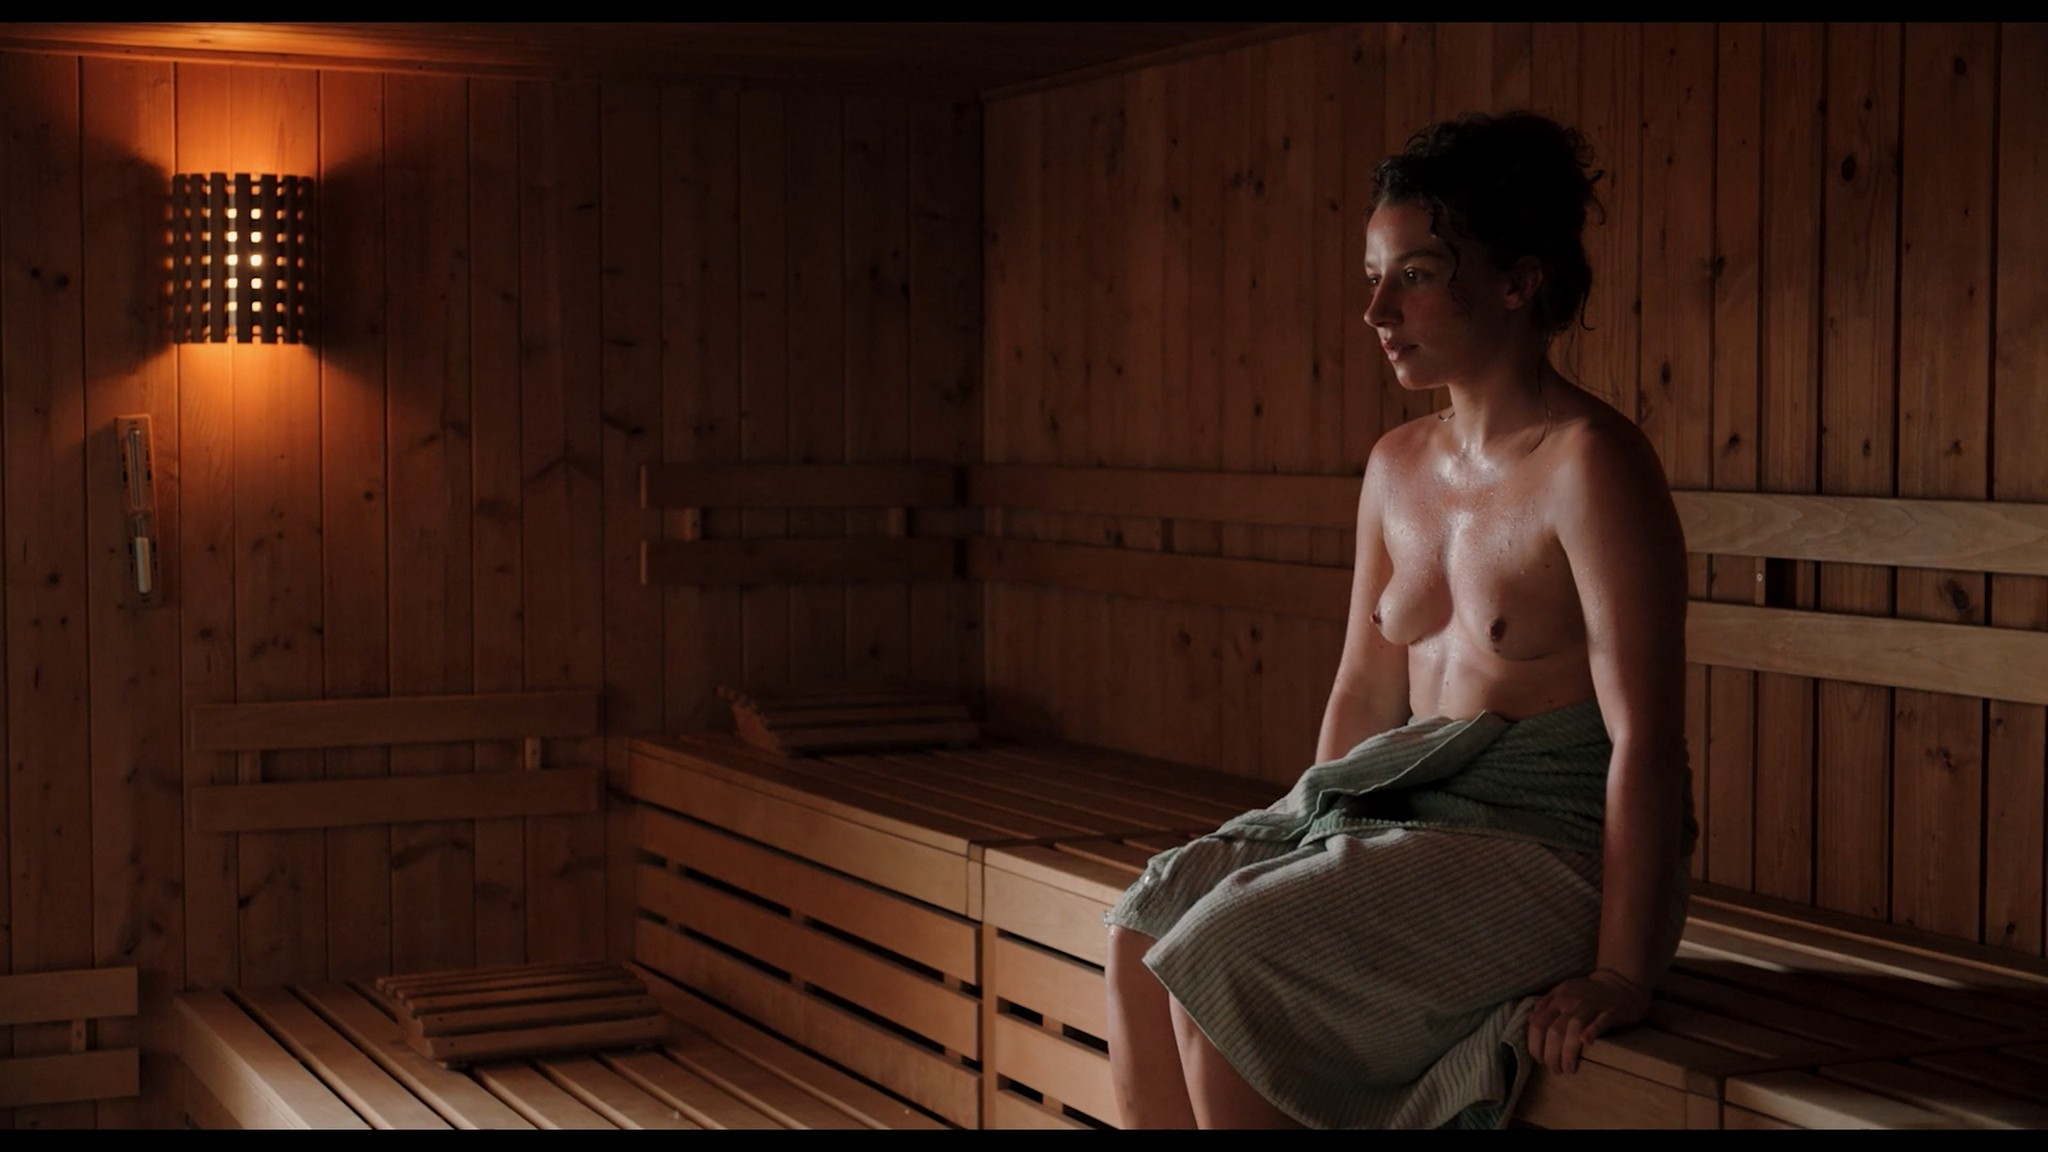 Antonia Bill nude full frontal Amanda da Gloria Helene Blechinger and others nude too Hitzig Ein Saunagang DE 2021 1080p 11